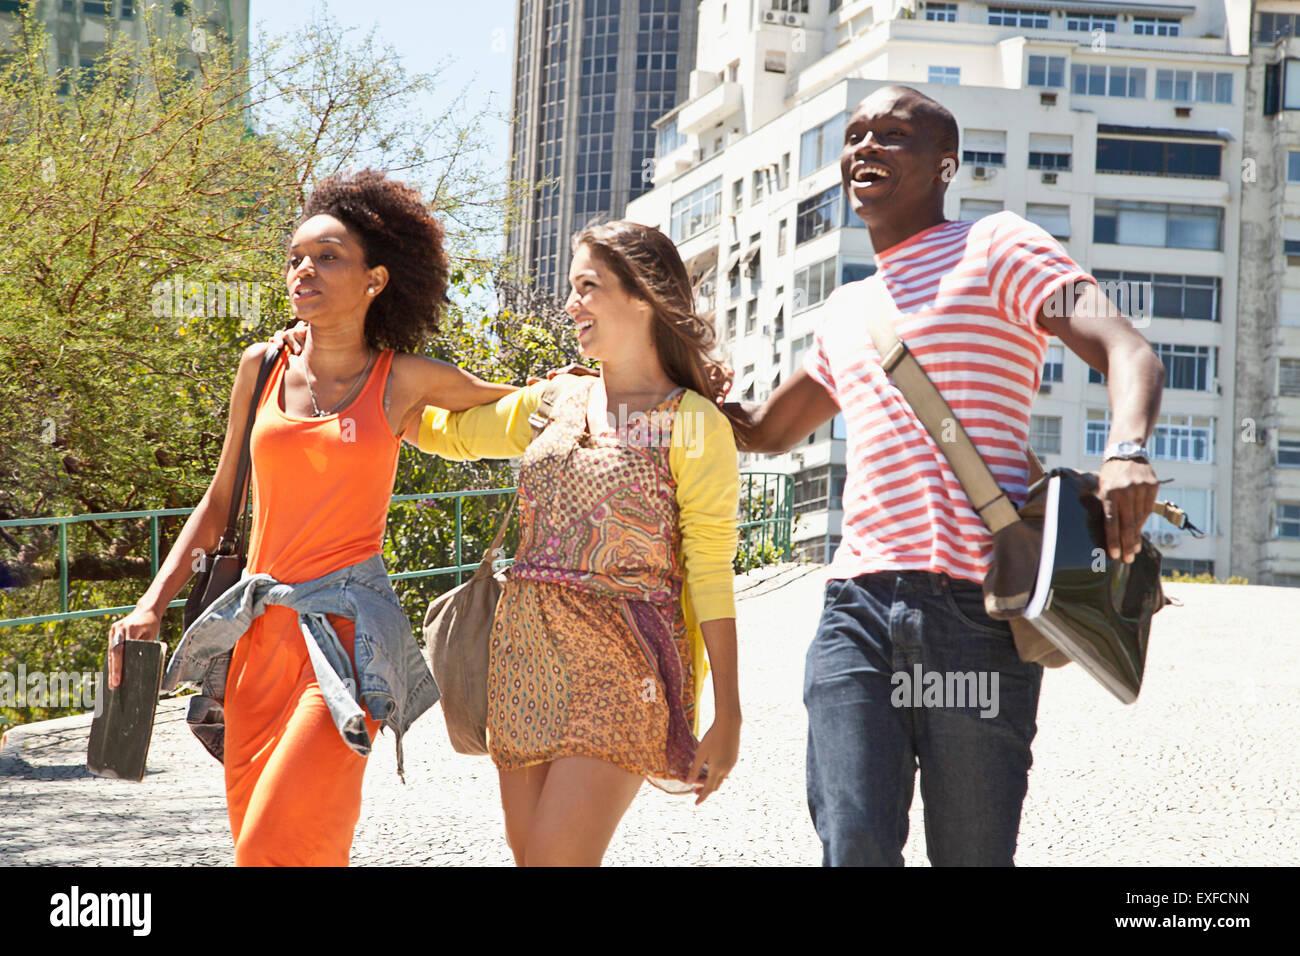 Students, Rio de Janeiro, Brazil - Stock Image